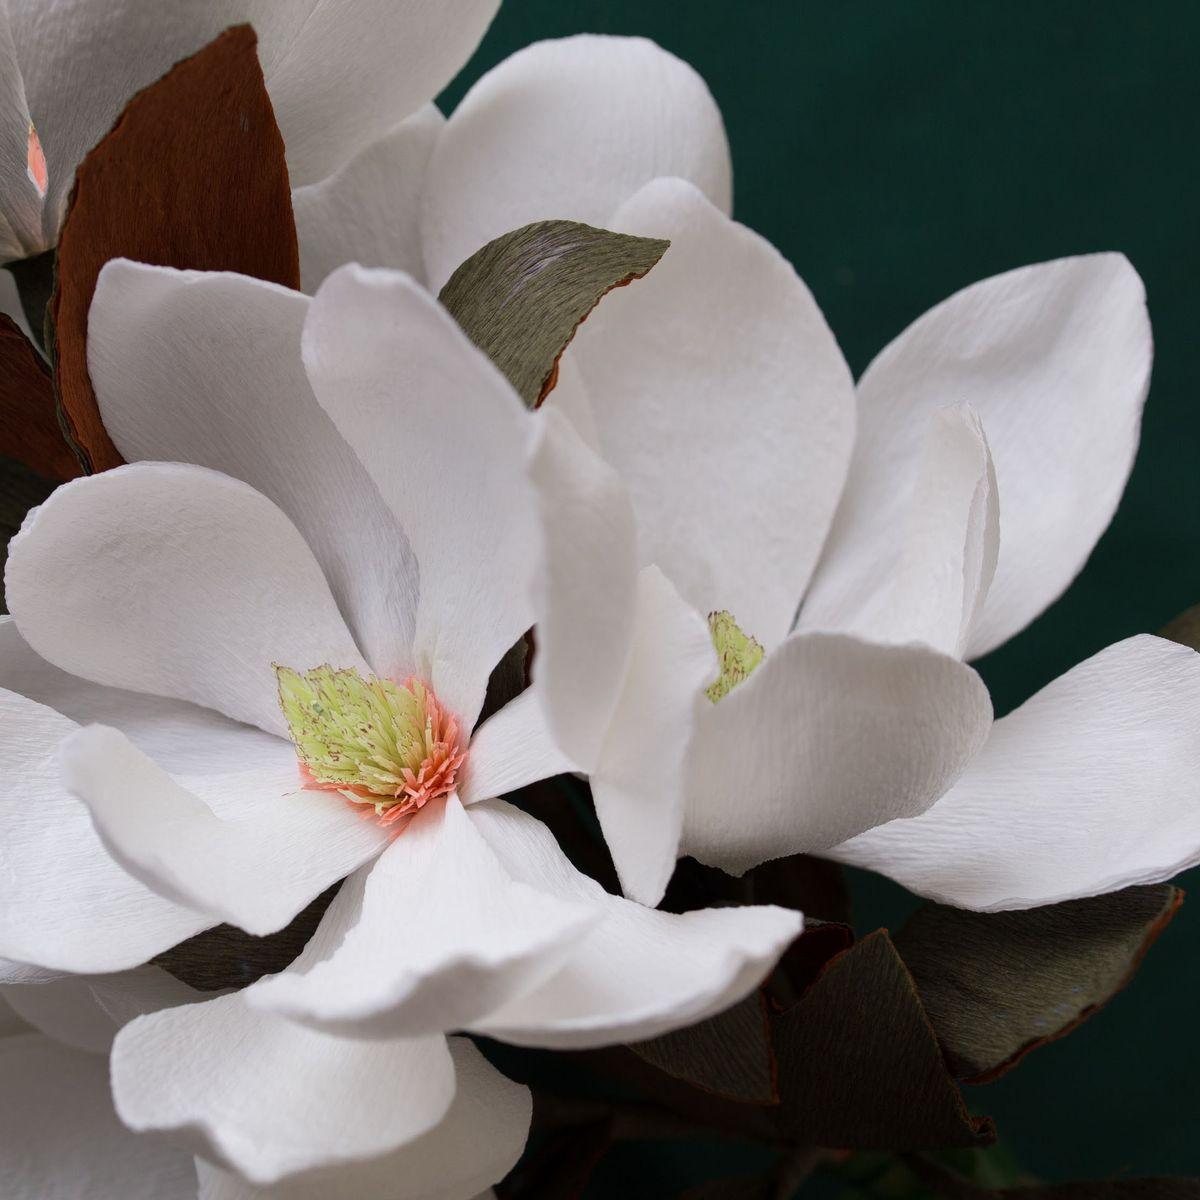 Magnolia paper flower tutorial from flowersmith by jennifer tran maxwellsz